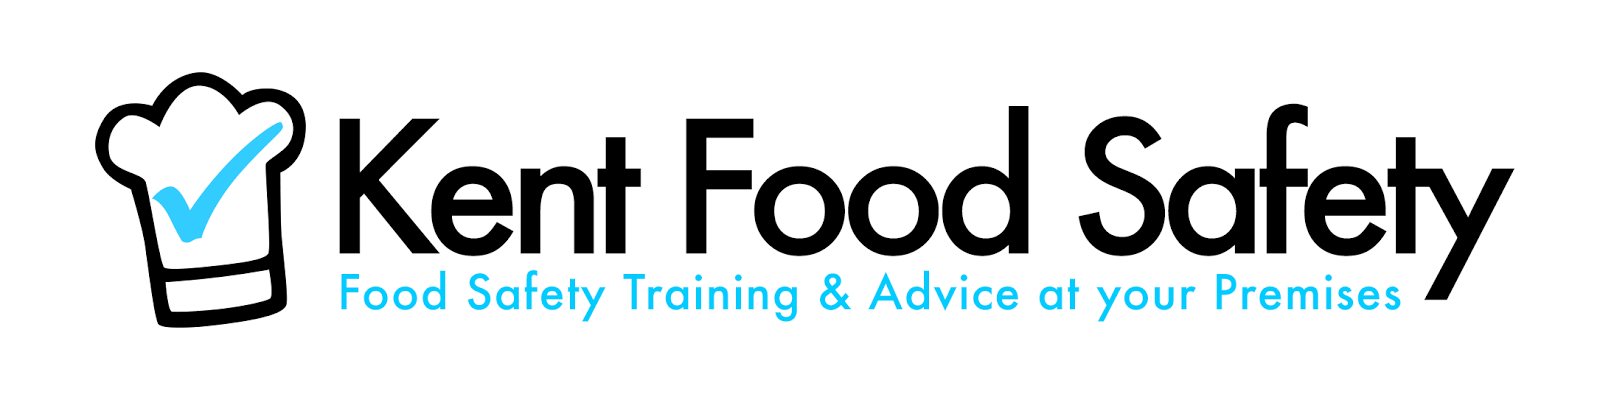 Kent Food Safety